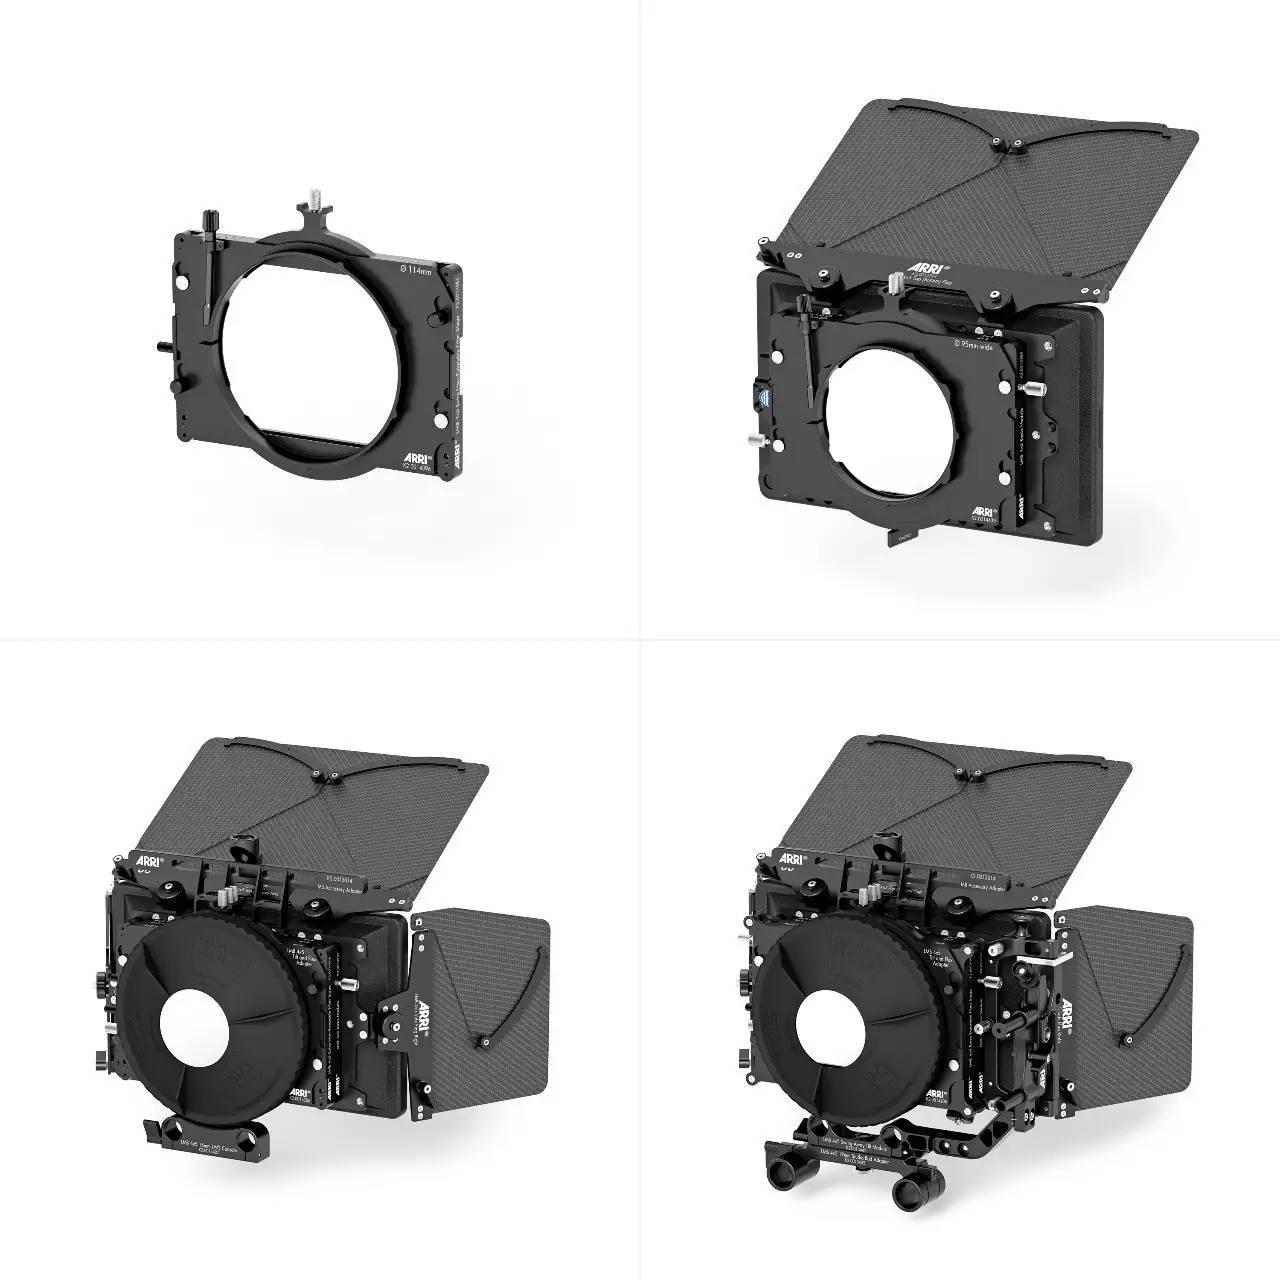 ARRI新款轻型遮光斗LMB 4x5 New Lightweight Matte Box